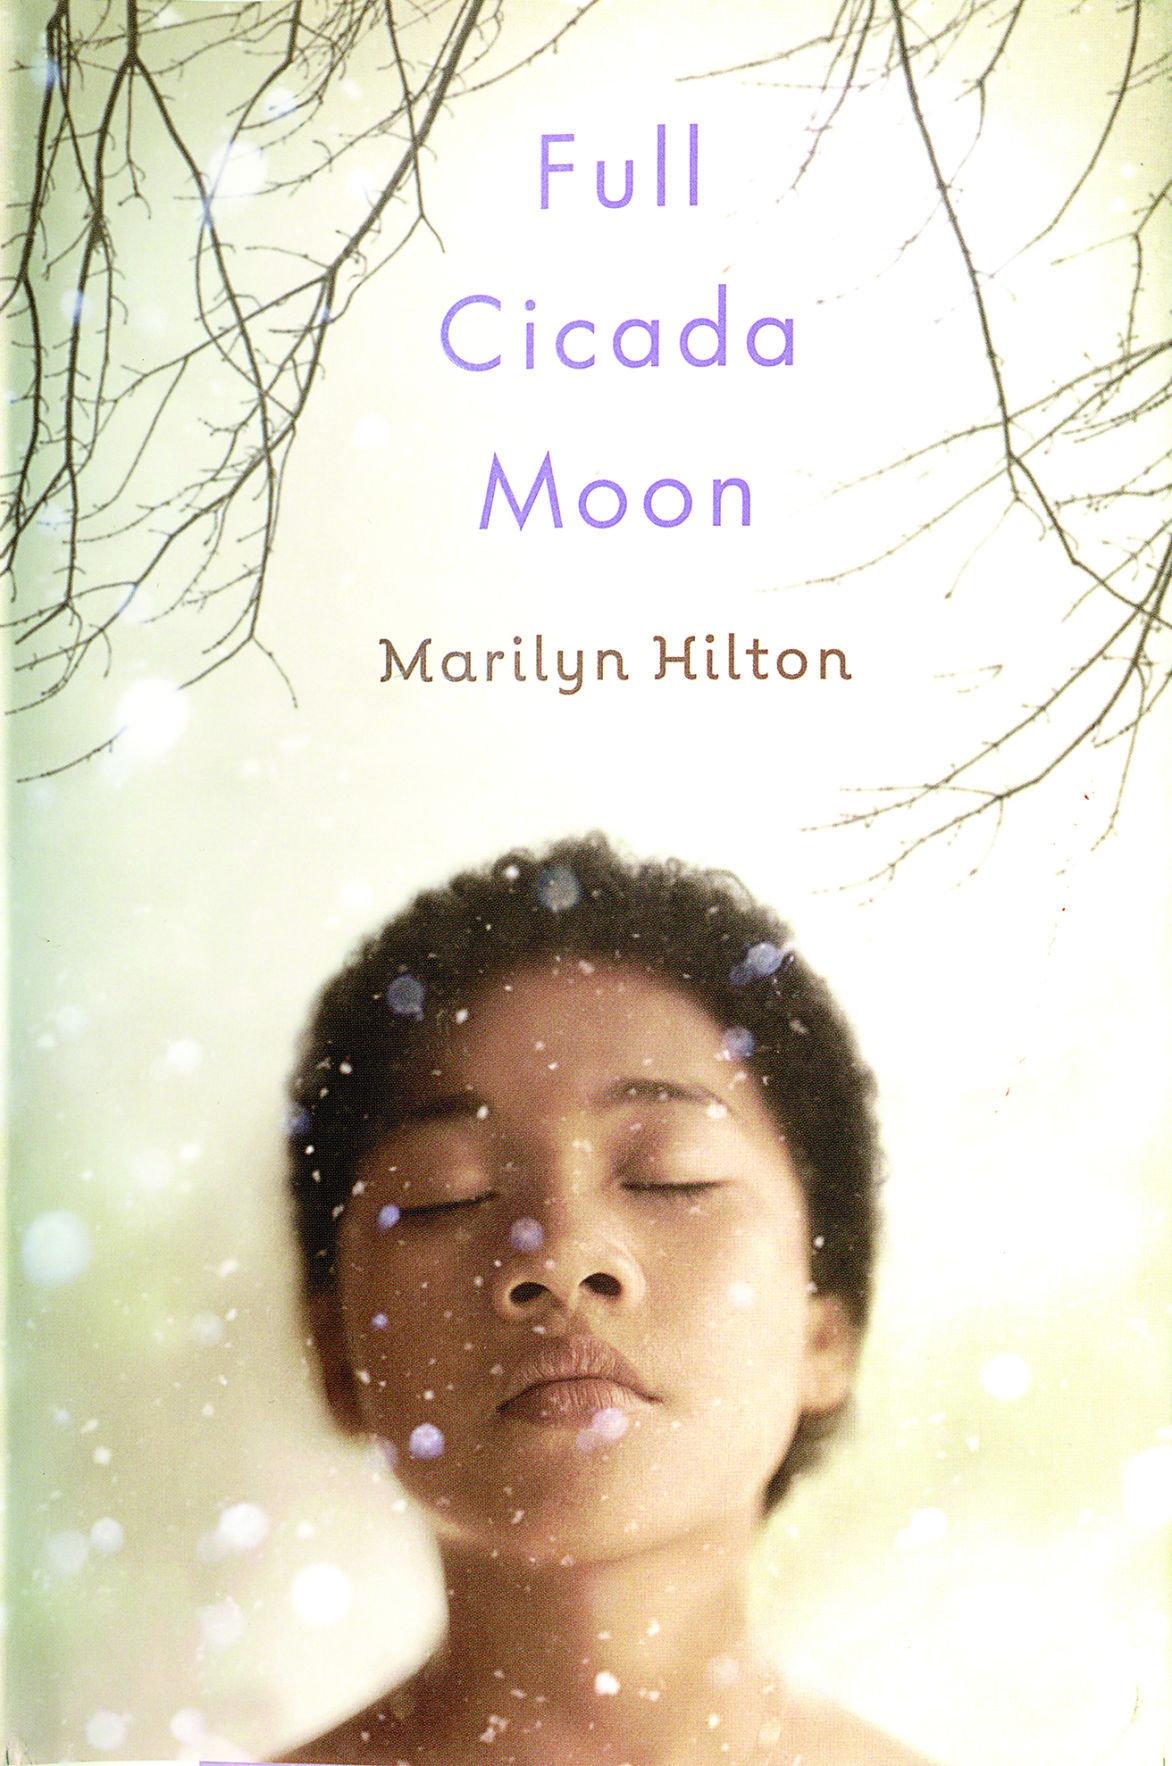 u2018under the cicada moon u2019 shows absurdity of labels